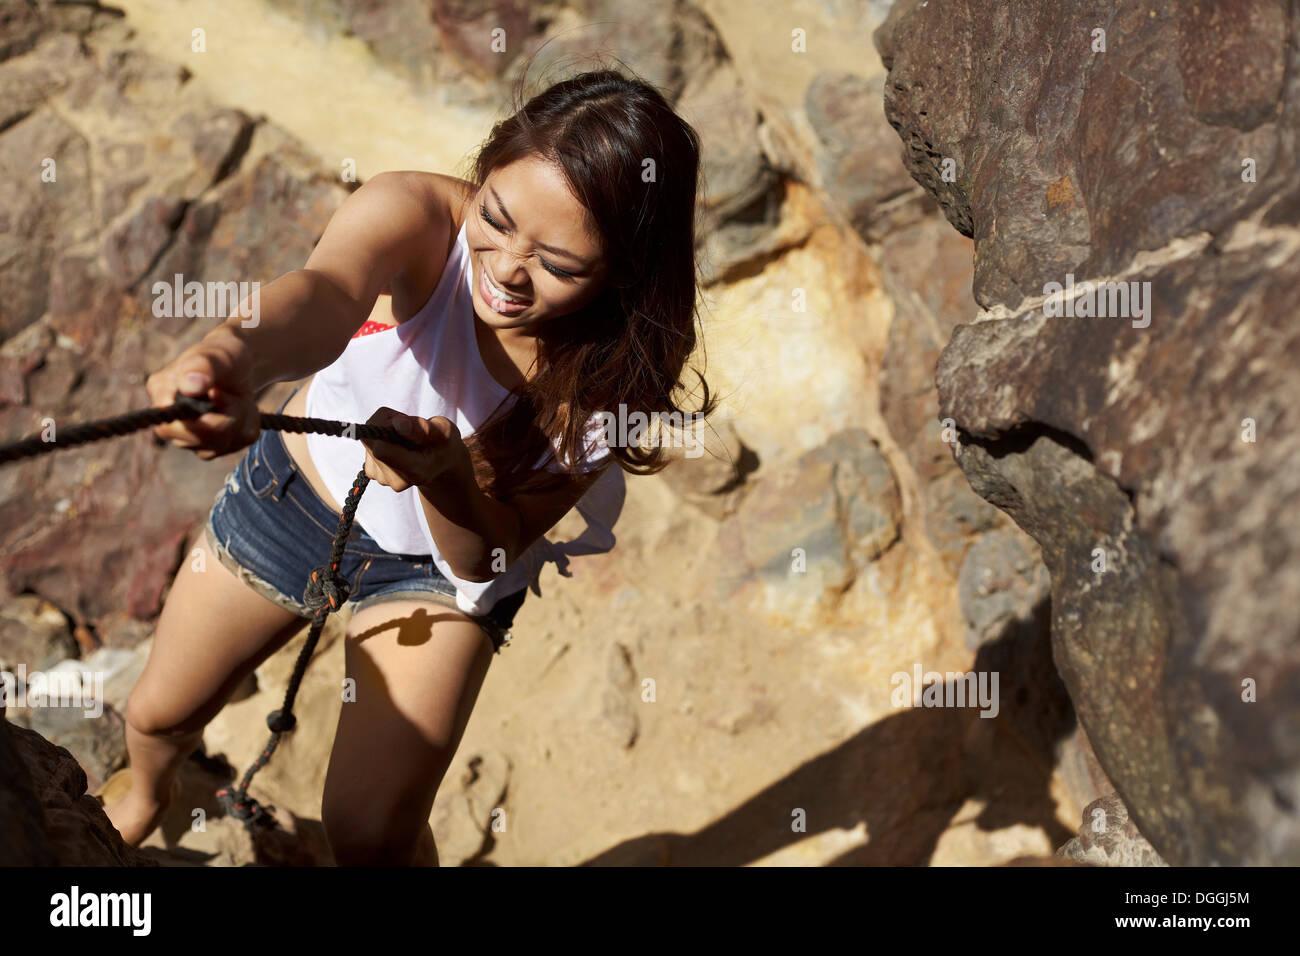 Young woman climbing rocks, Palos Verdes, California, USA - Stock Image